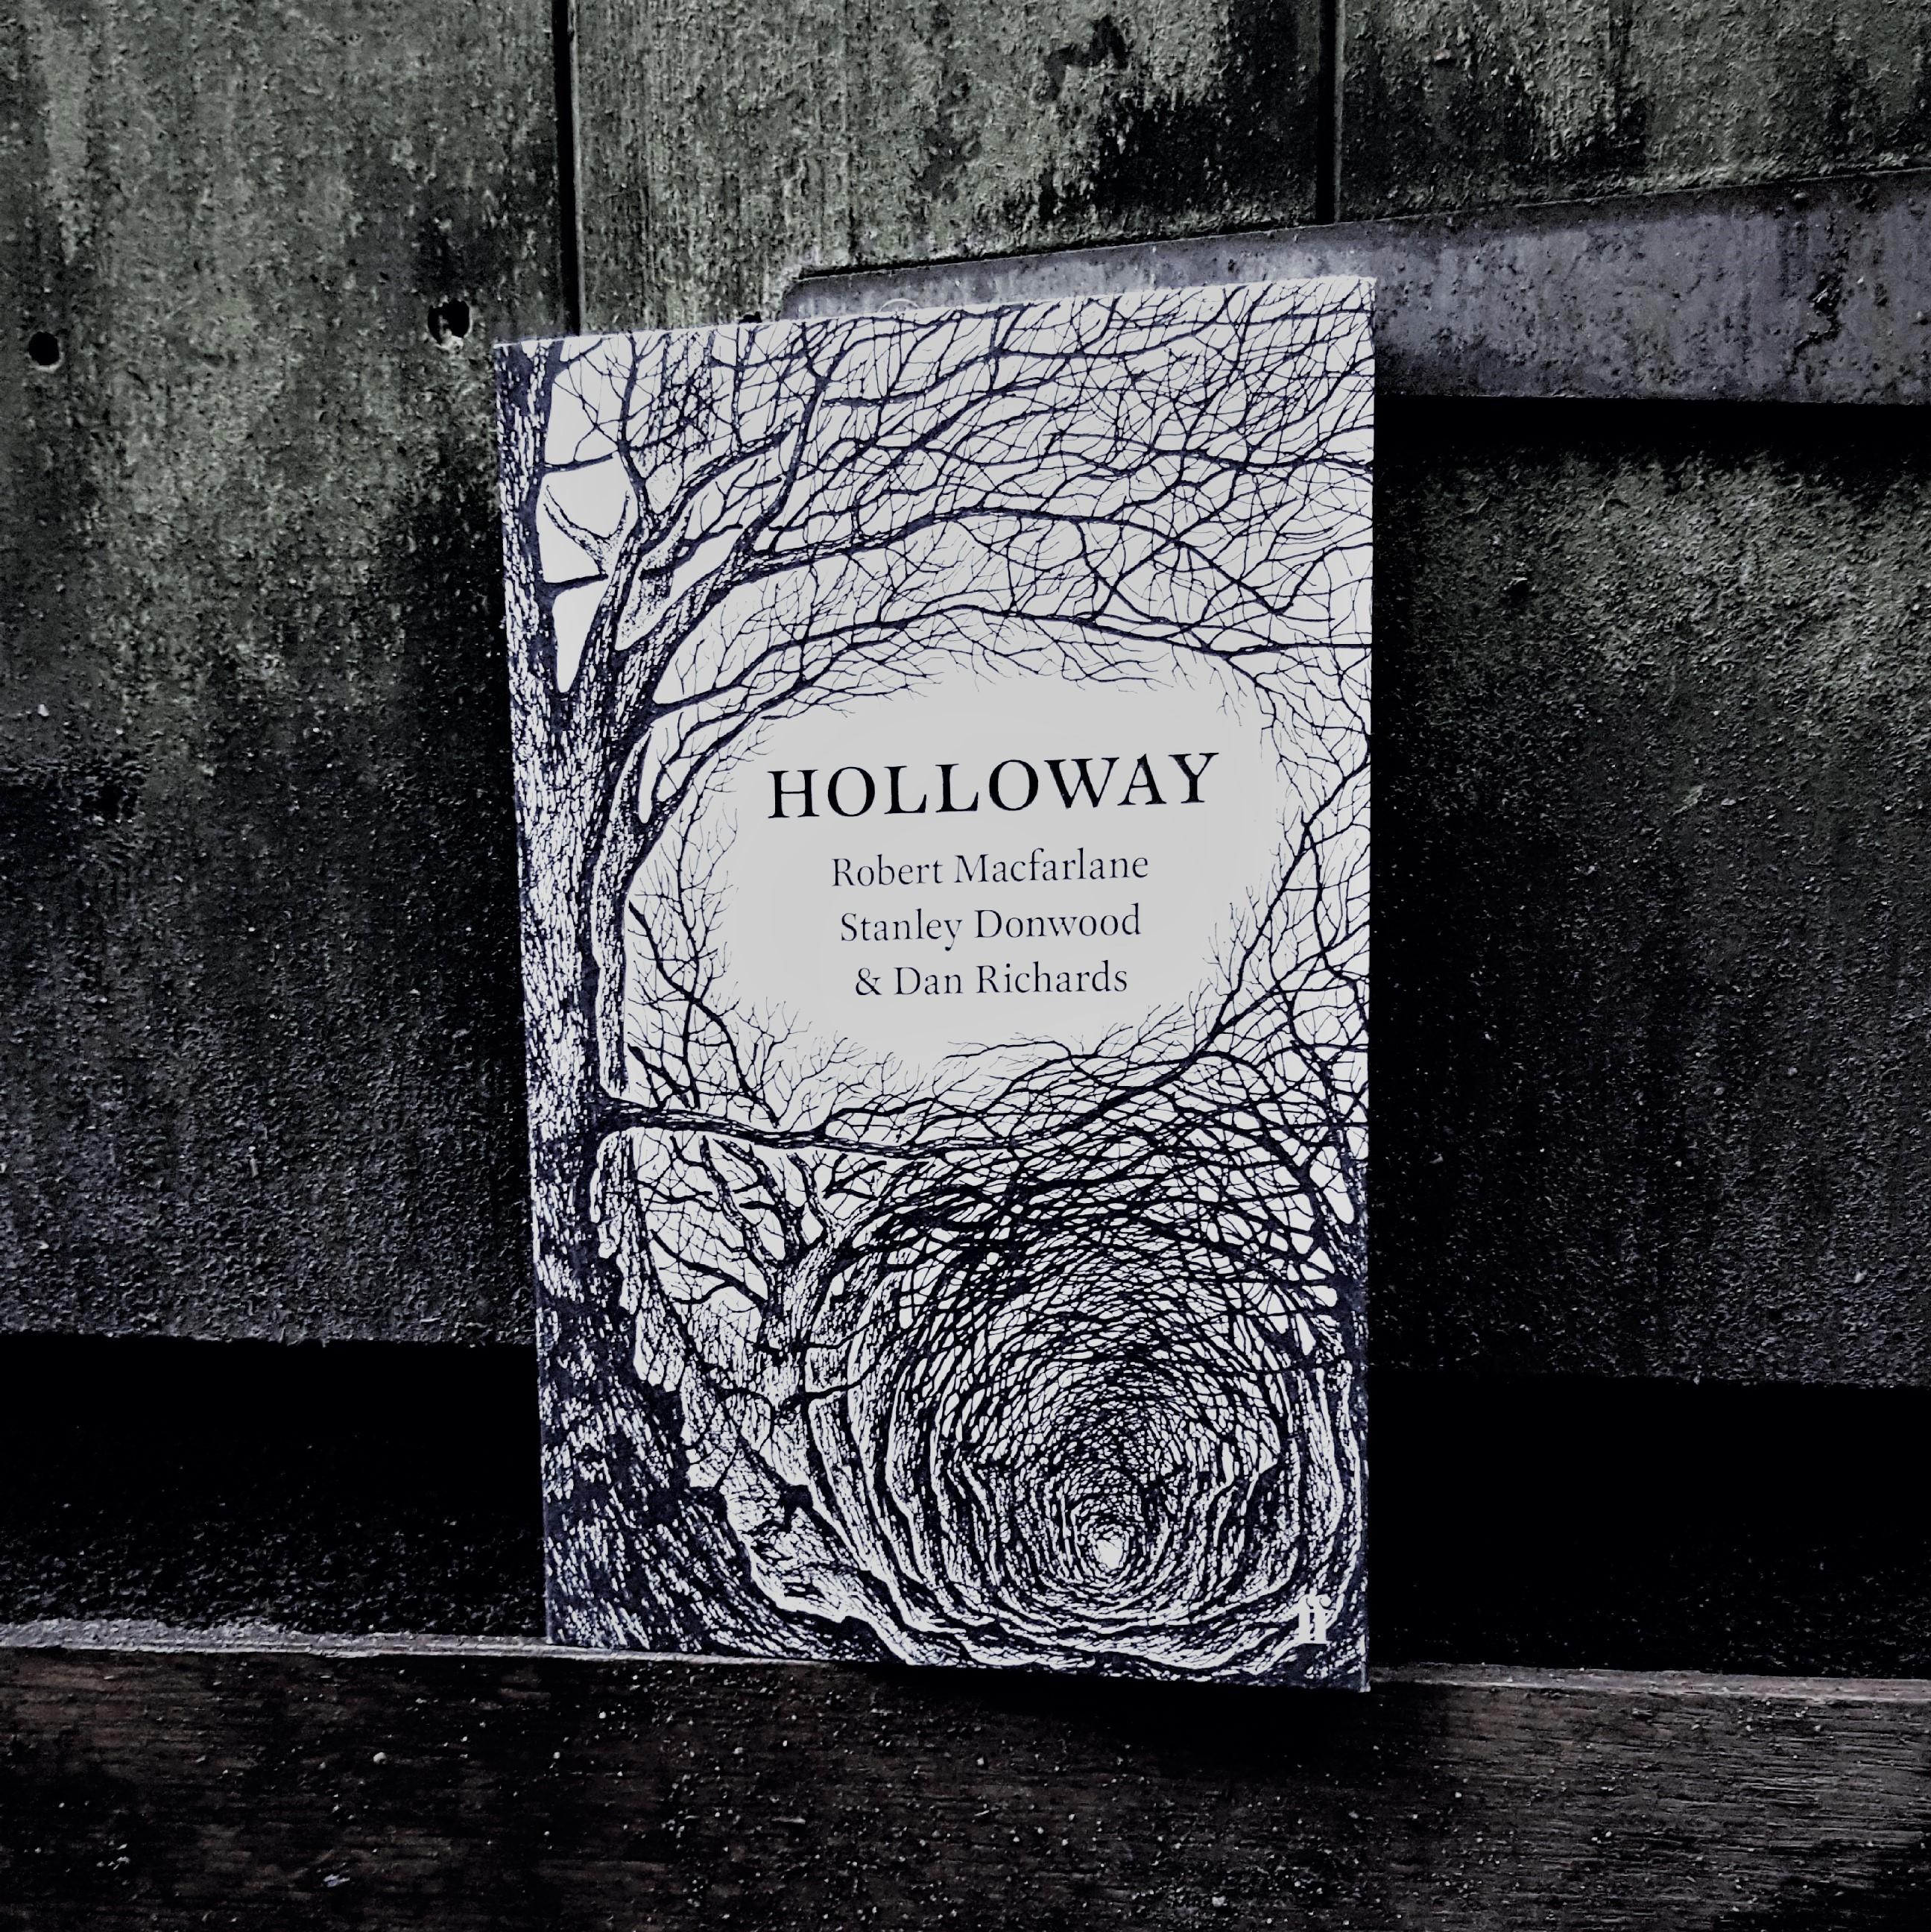 Holloway - by Robert Macfarlane, Stanley Donwood, and Dan Richards - book review.